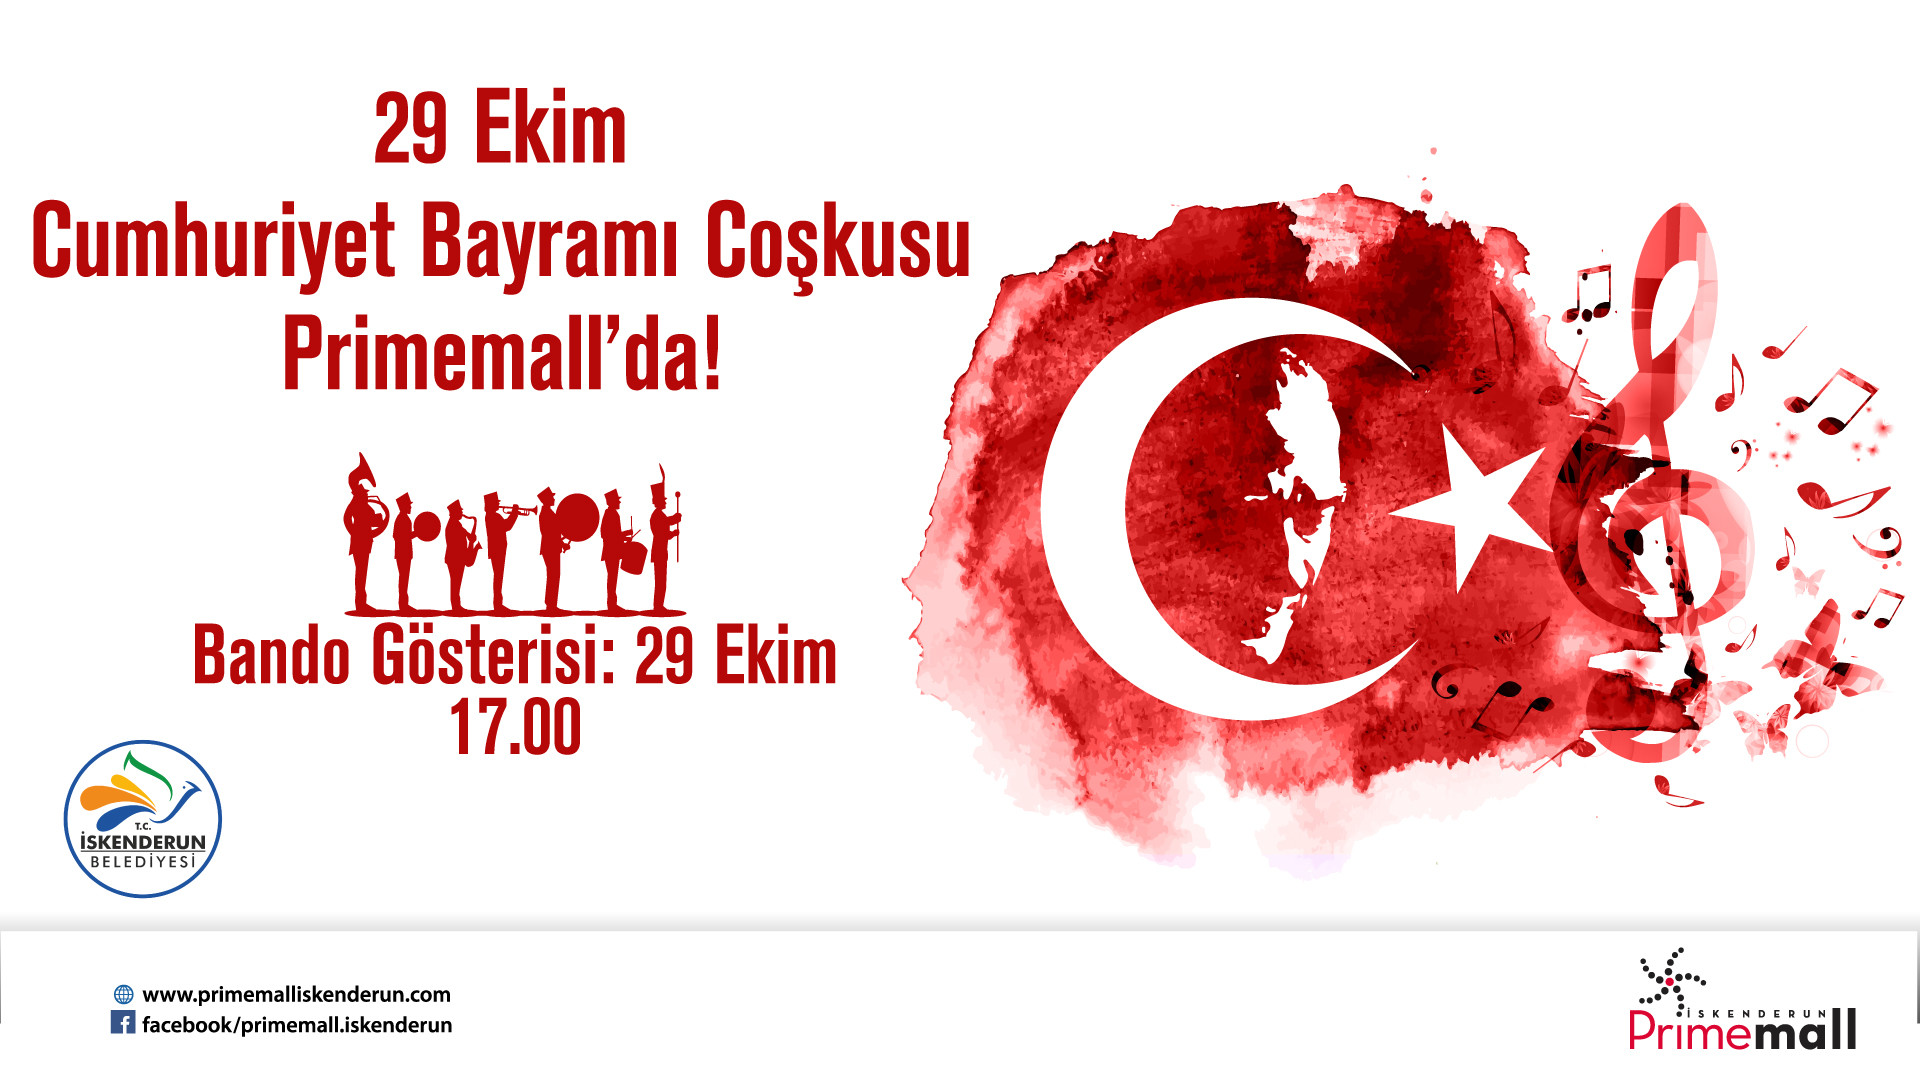 29 Ekim Cumhuriyet Bayramı Bandosu Primemall'da